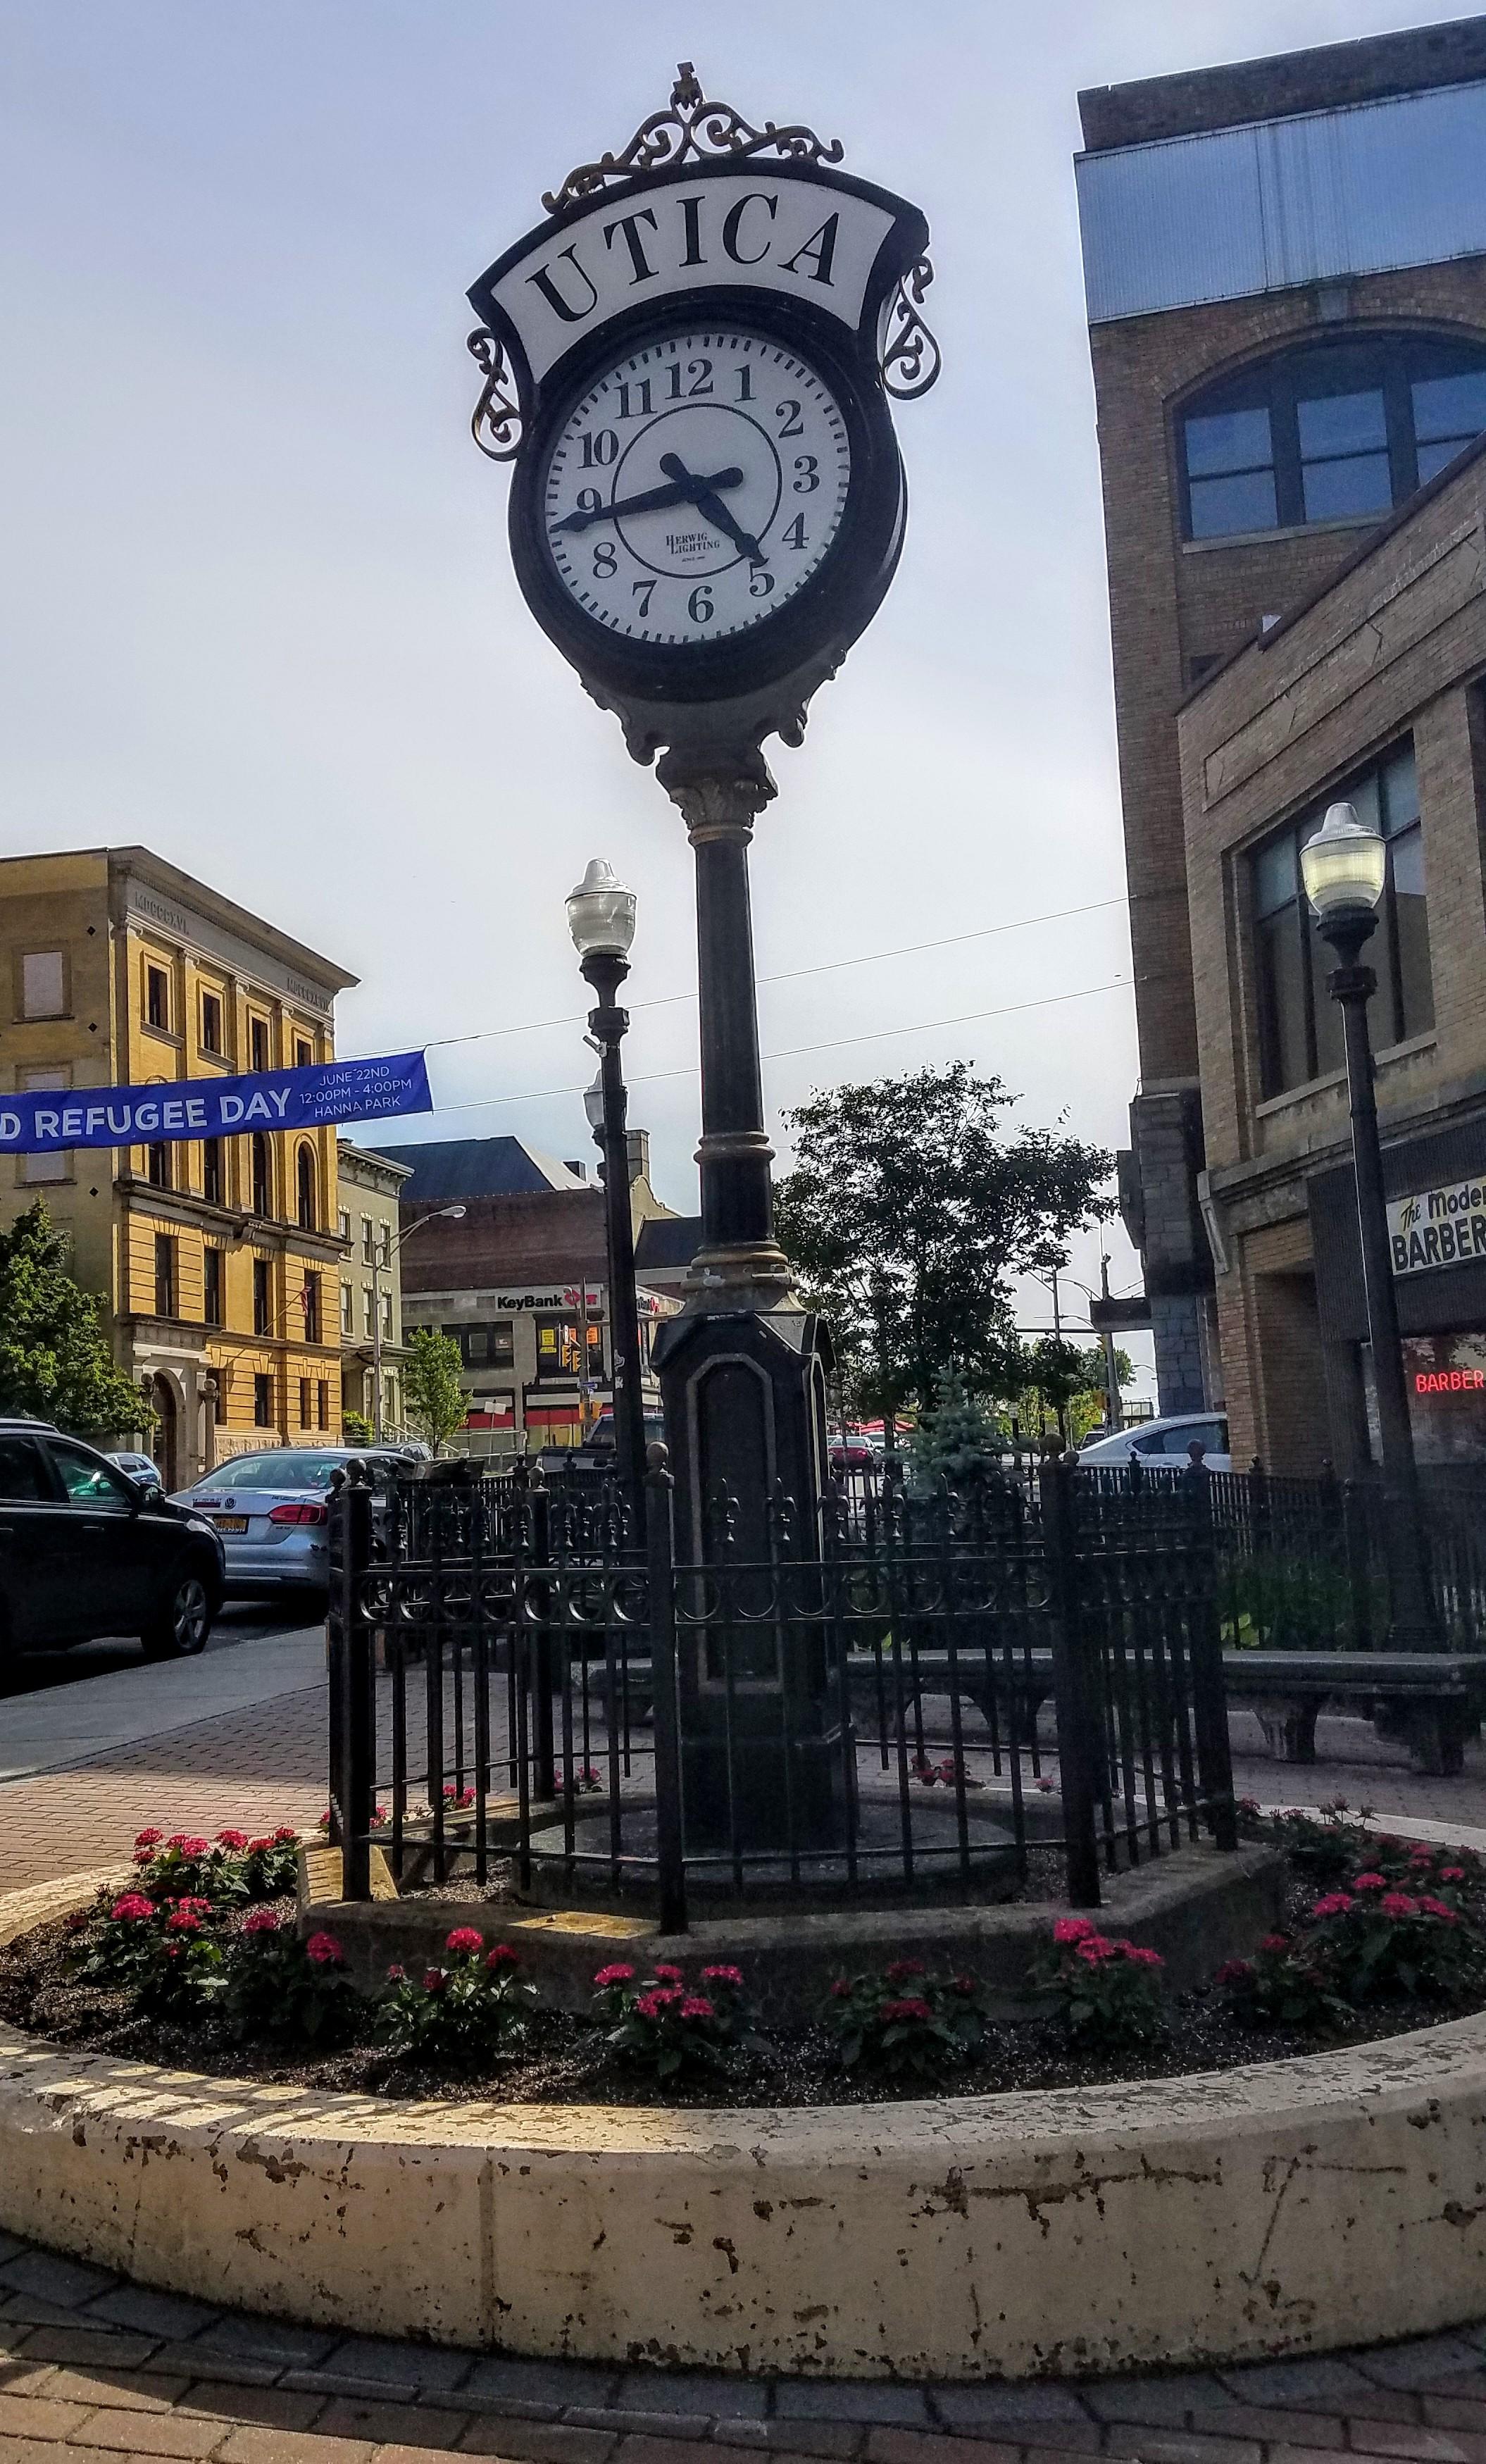 I like these city clocks